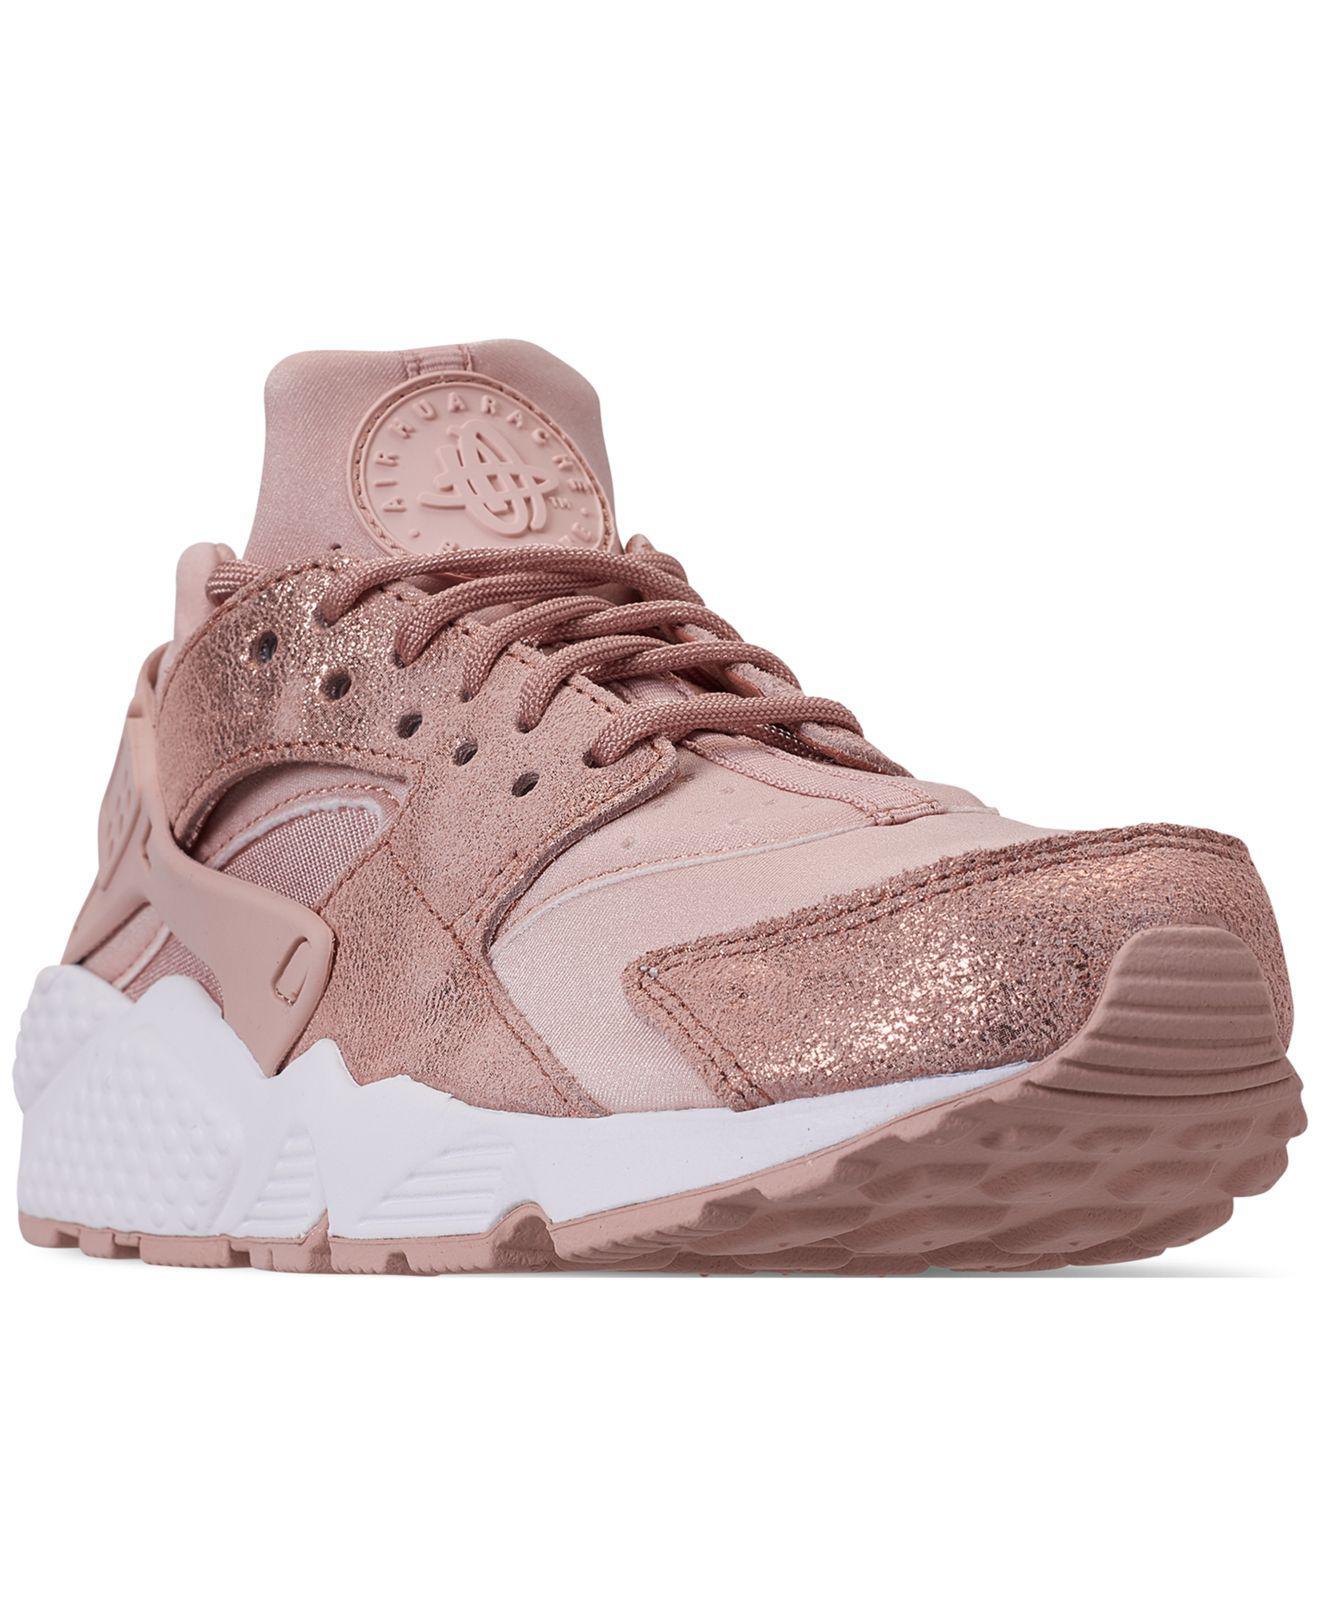 official photos 42812 1848b Nike - Natural Air Huarache Run Bl Running Sneakers From Finish Line -  Lyst. View fullscreen